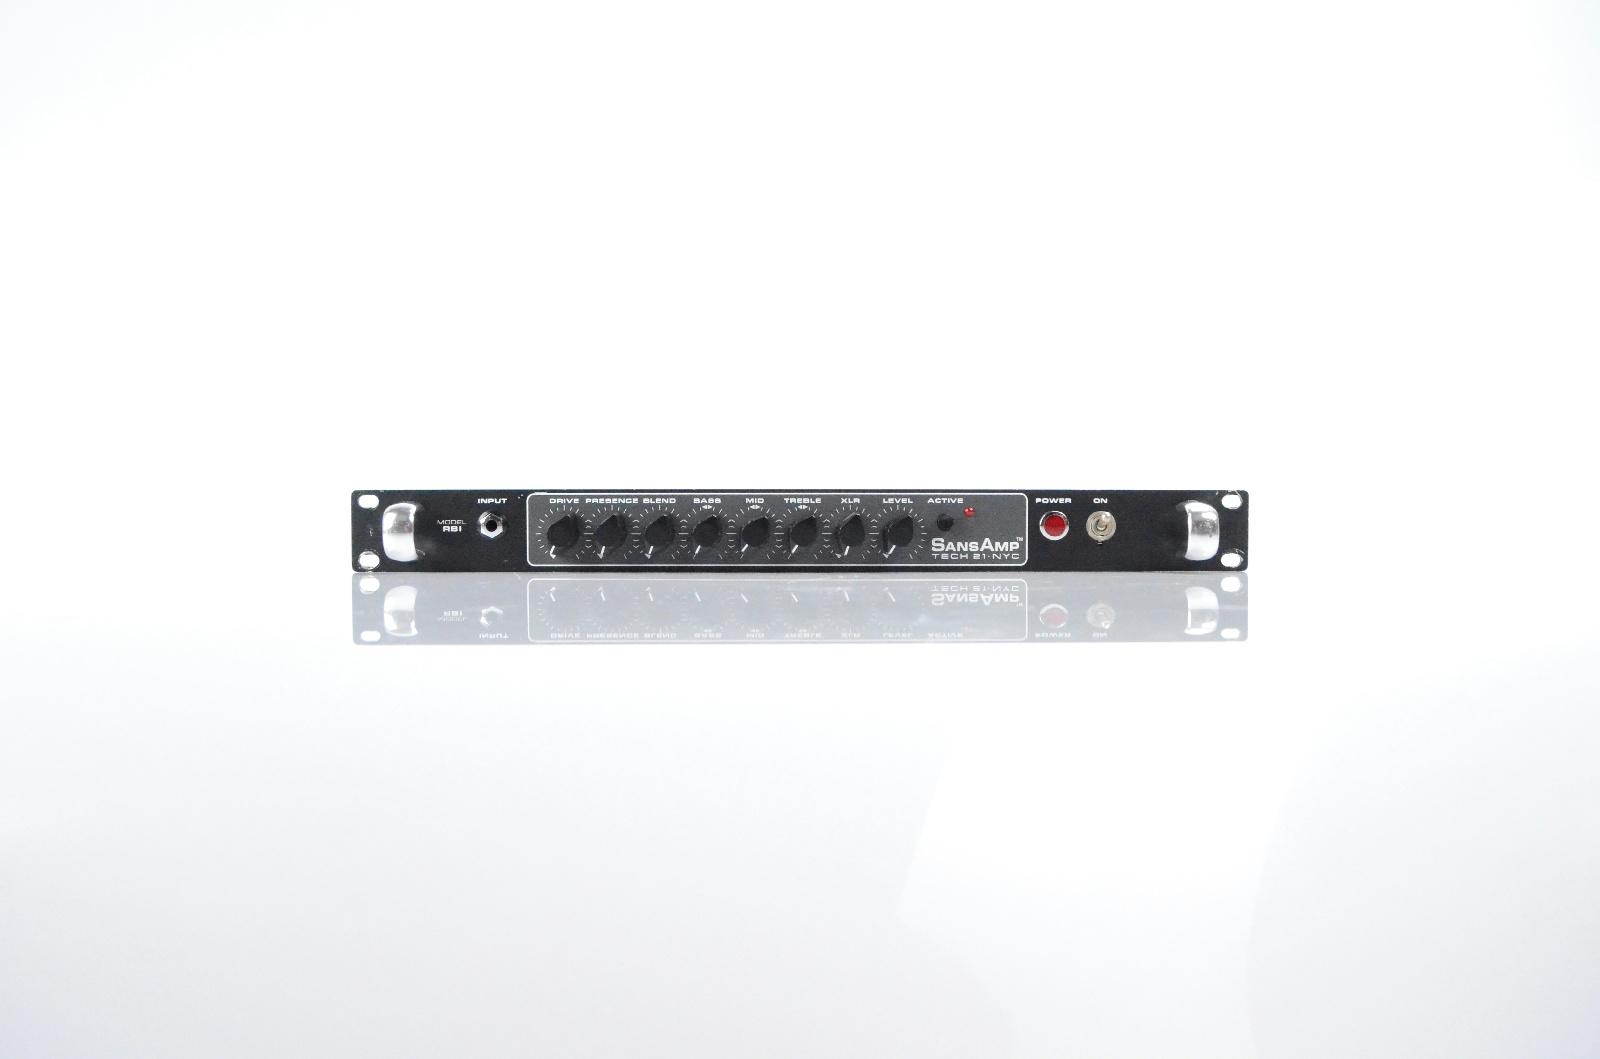 Tech21 SansAmp RBI Bass Guitar Interface Owned by Justin Meldal-Johnsen #32827